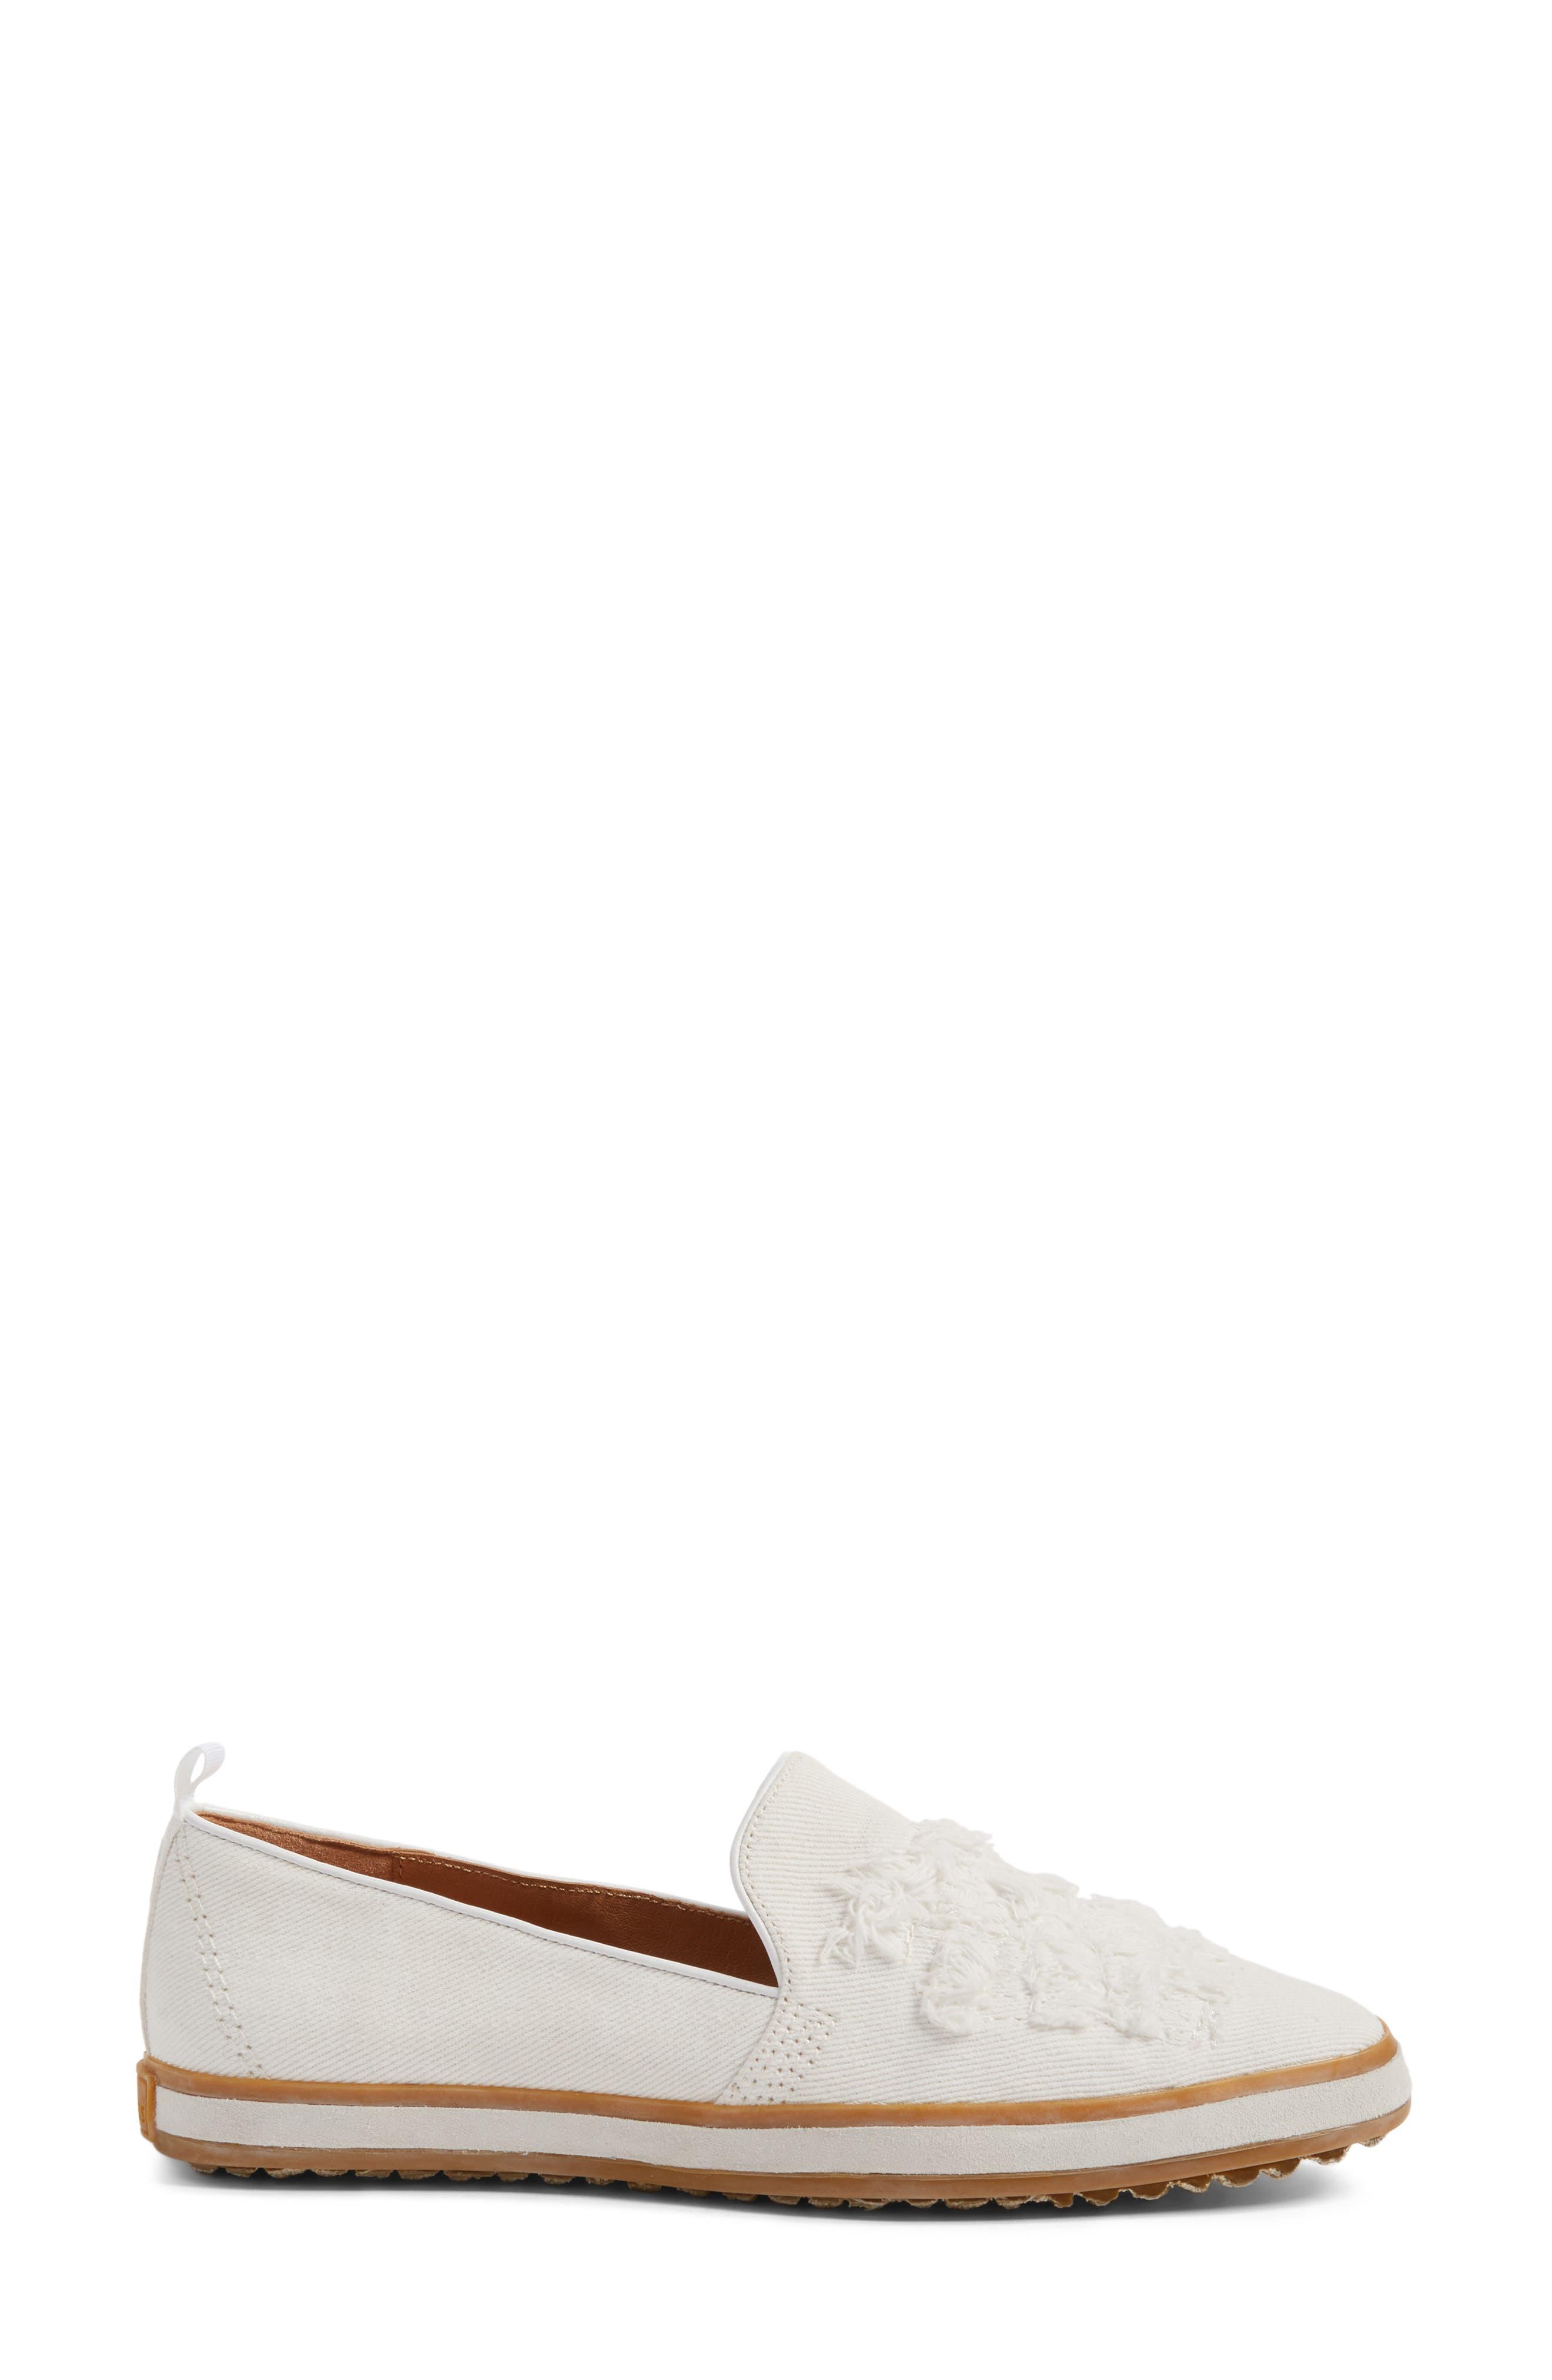 Sutton Loafer Flat,                             Alternate thumbnail 3, color,                             White